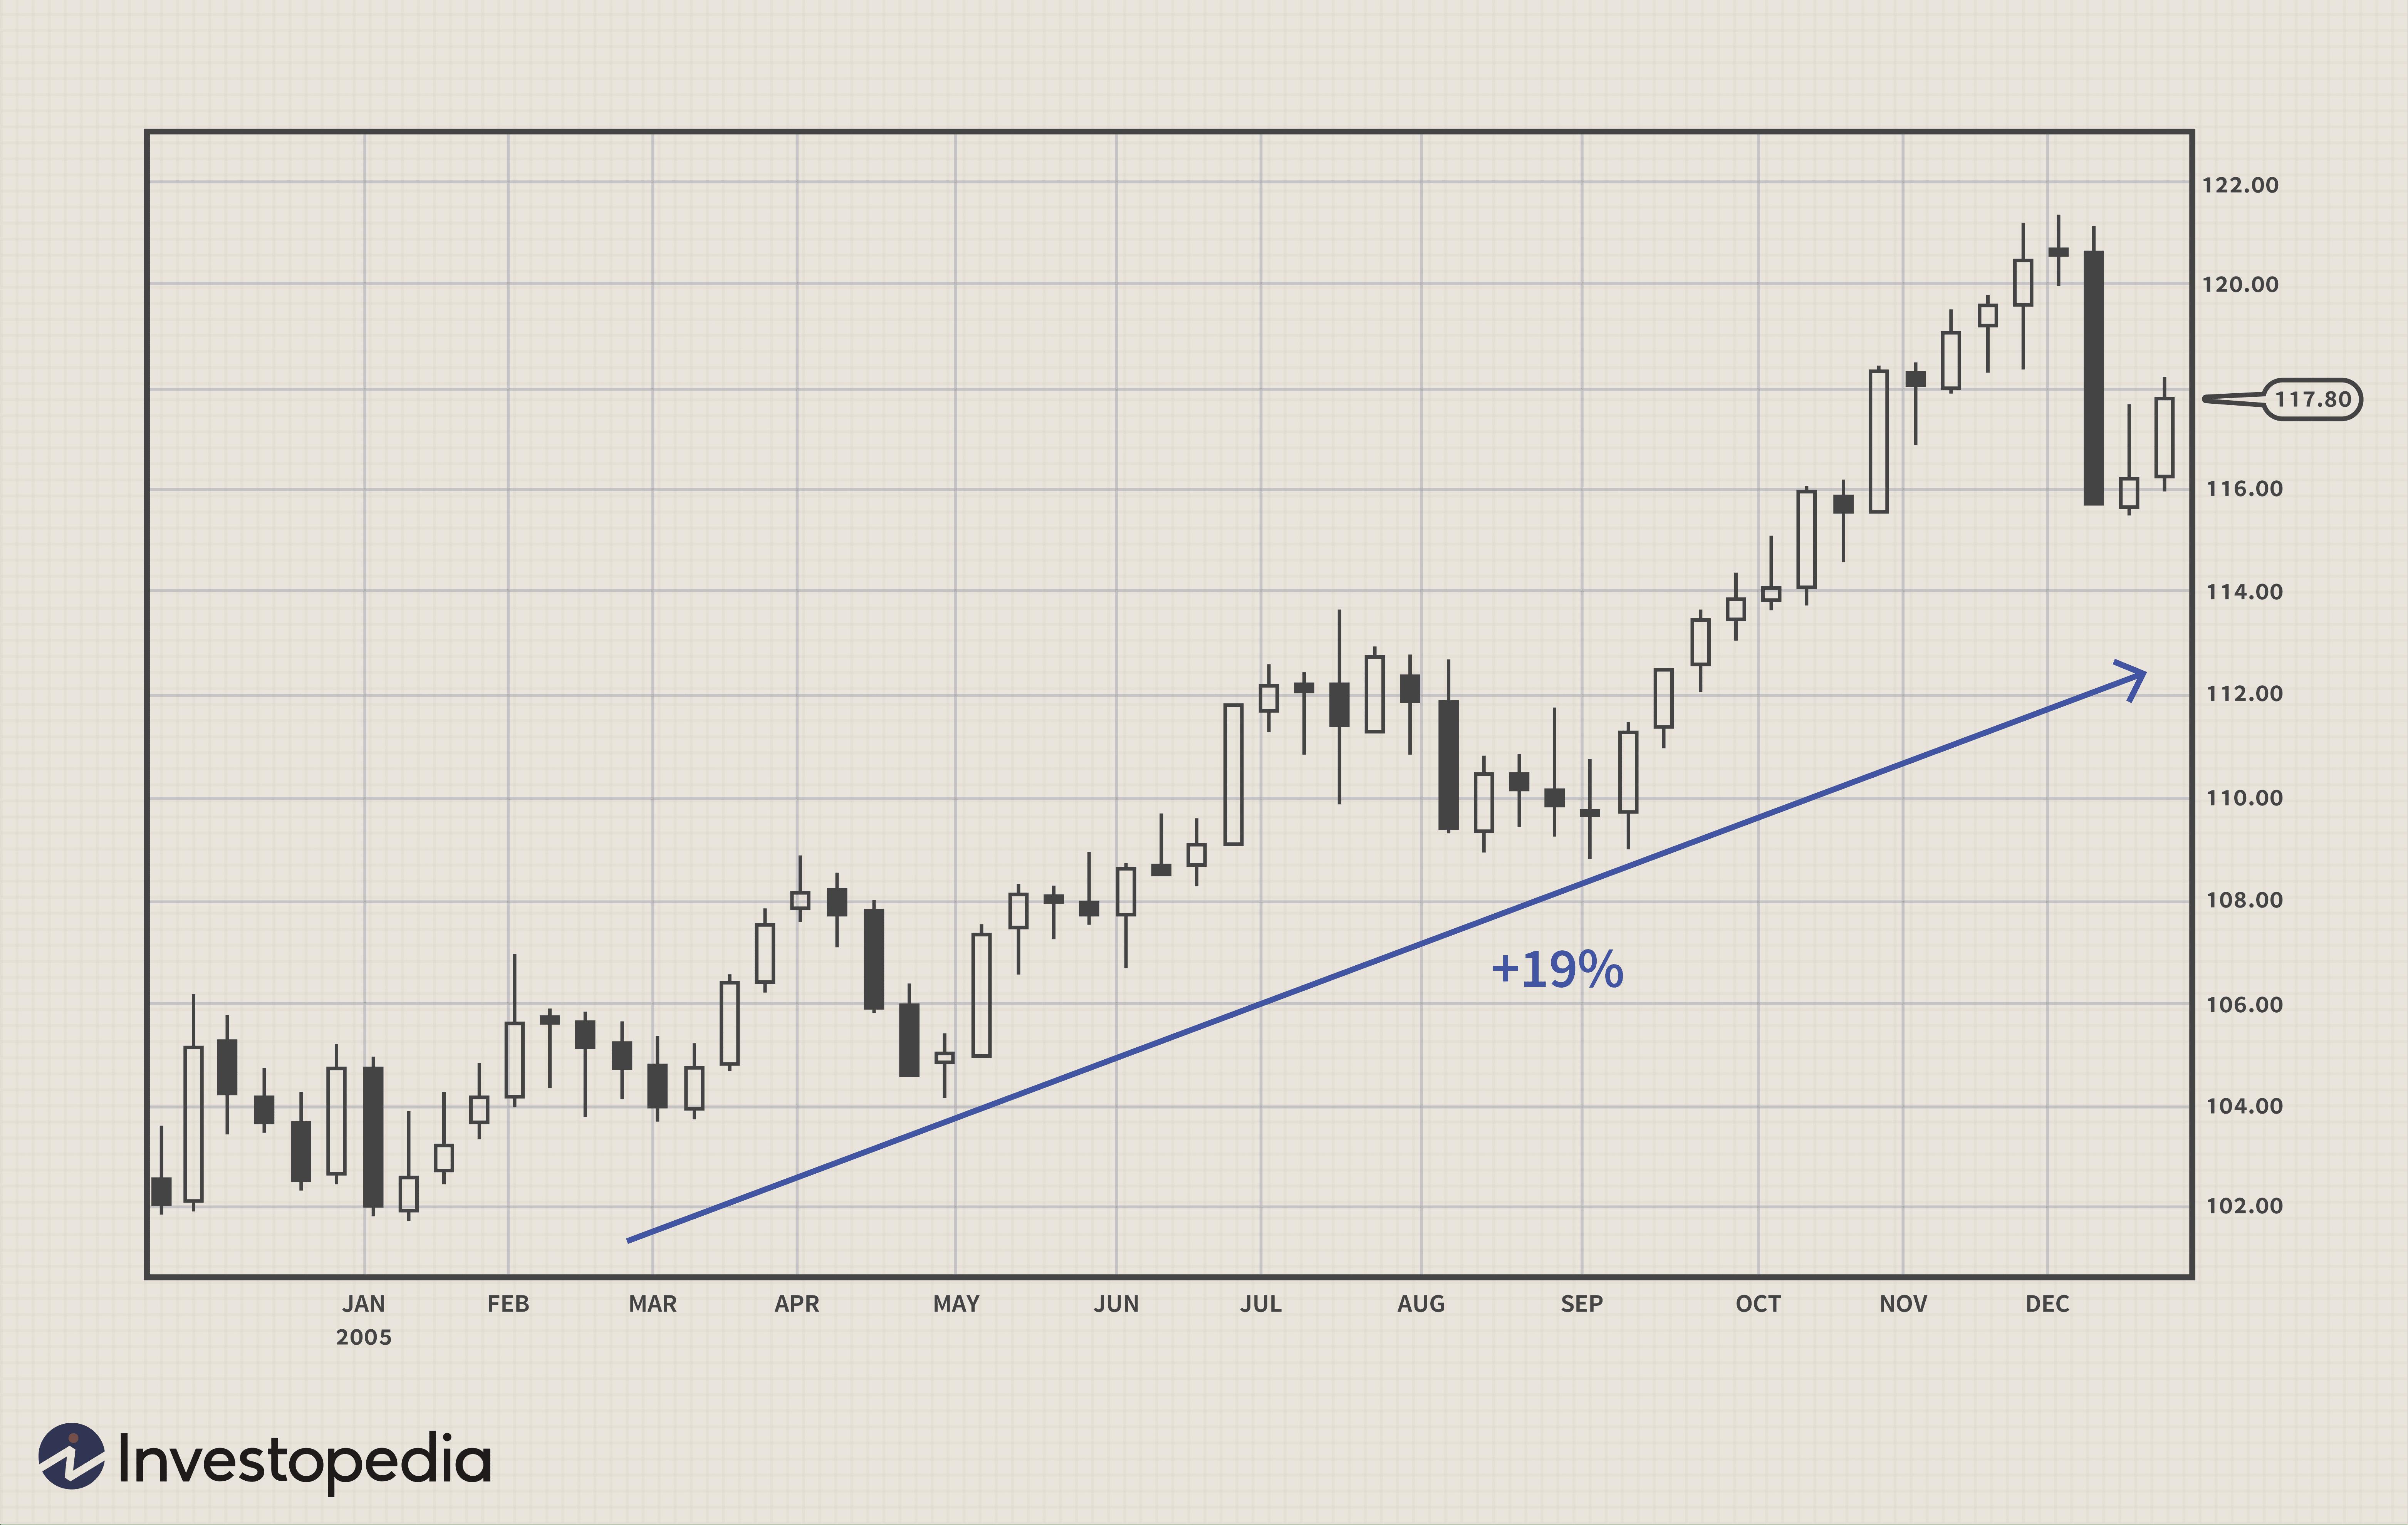 trik rahindonesia trading forex